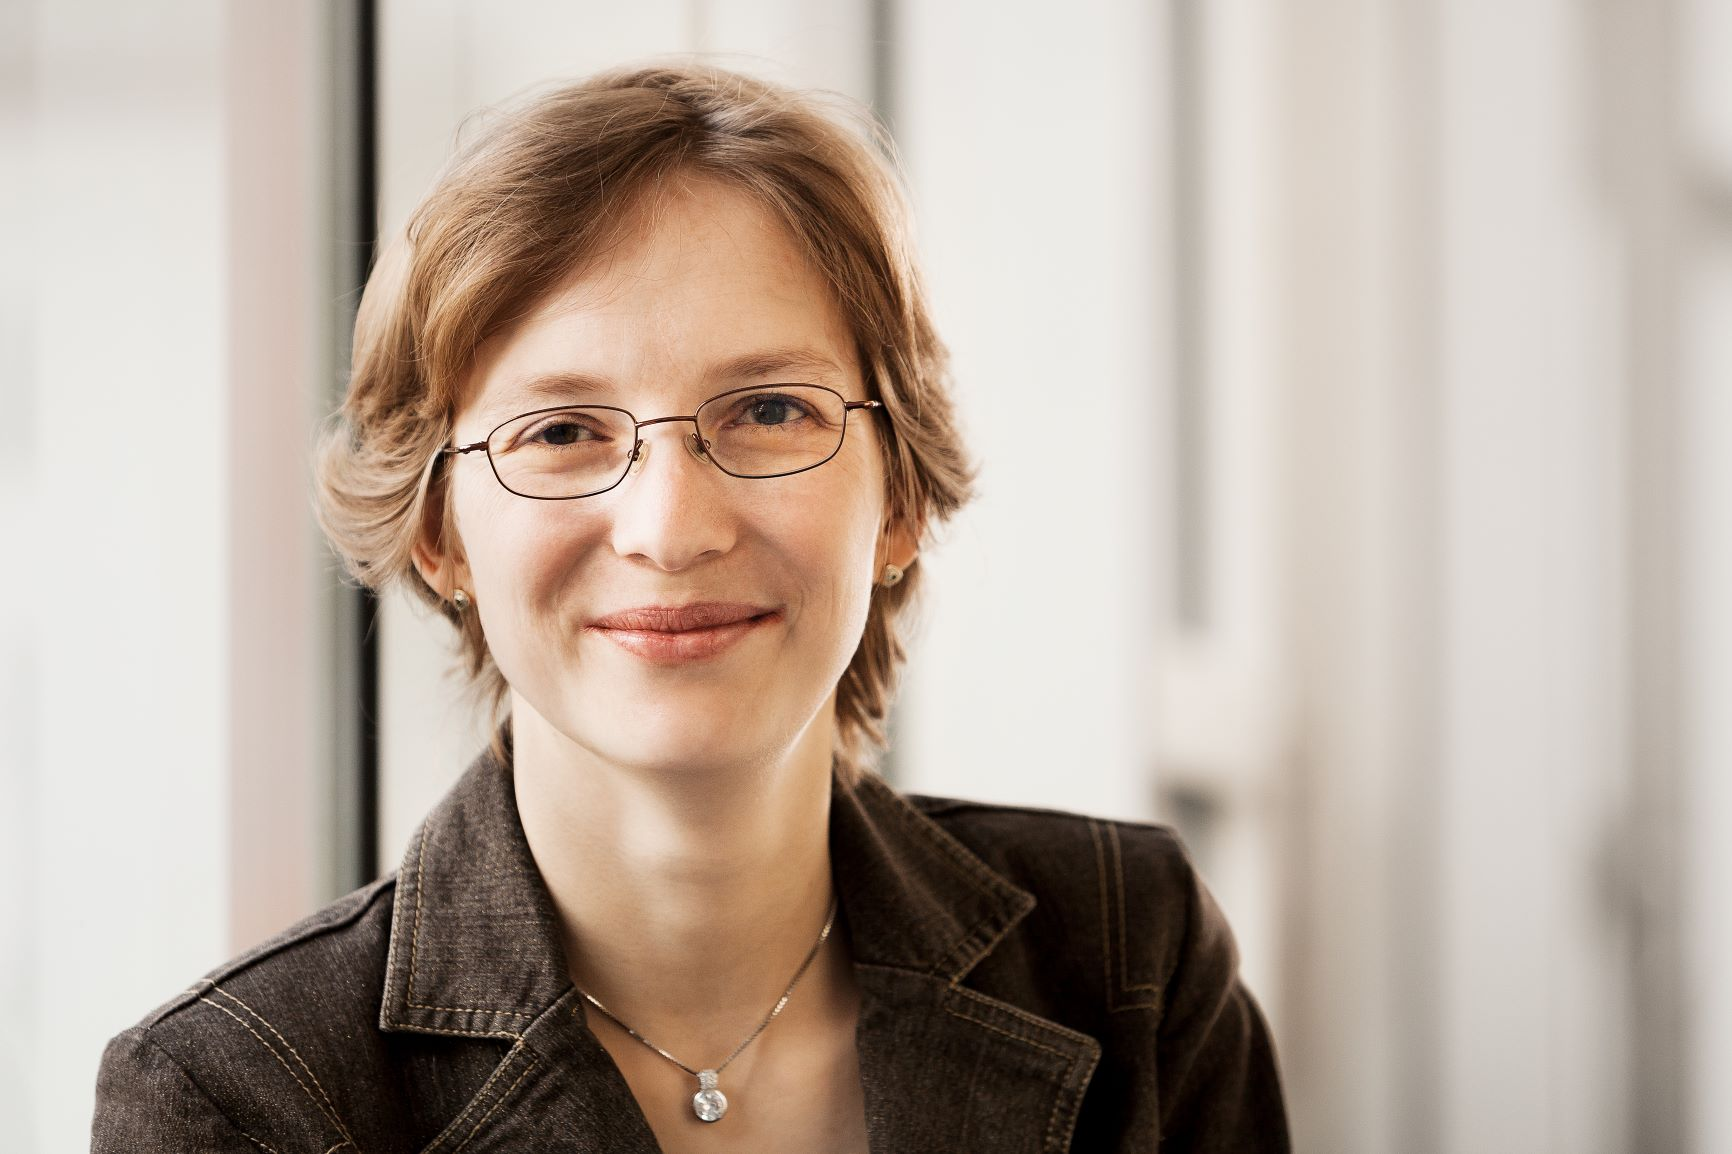 Tatjana Schweizer